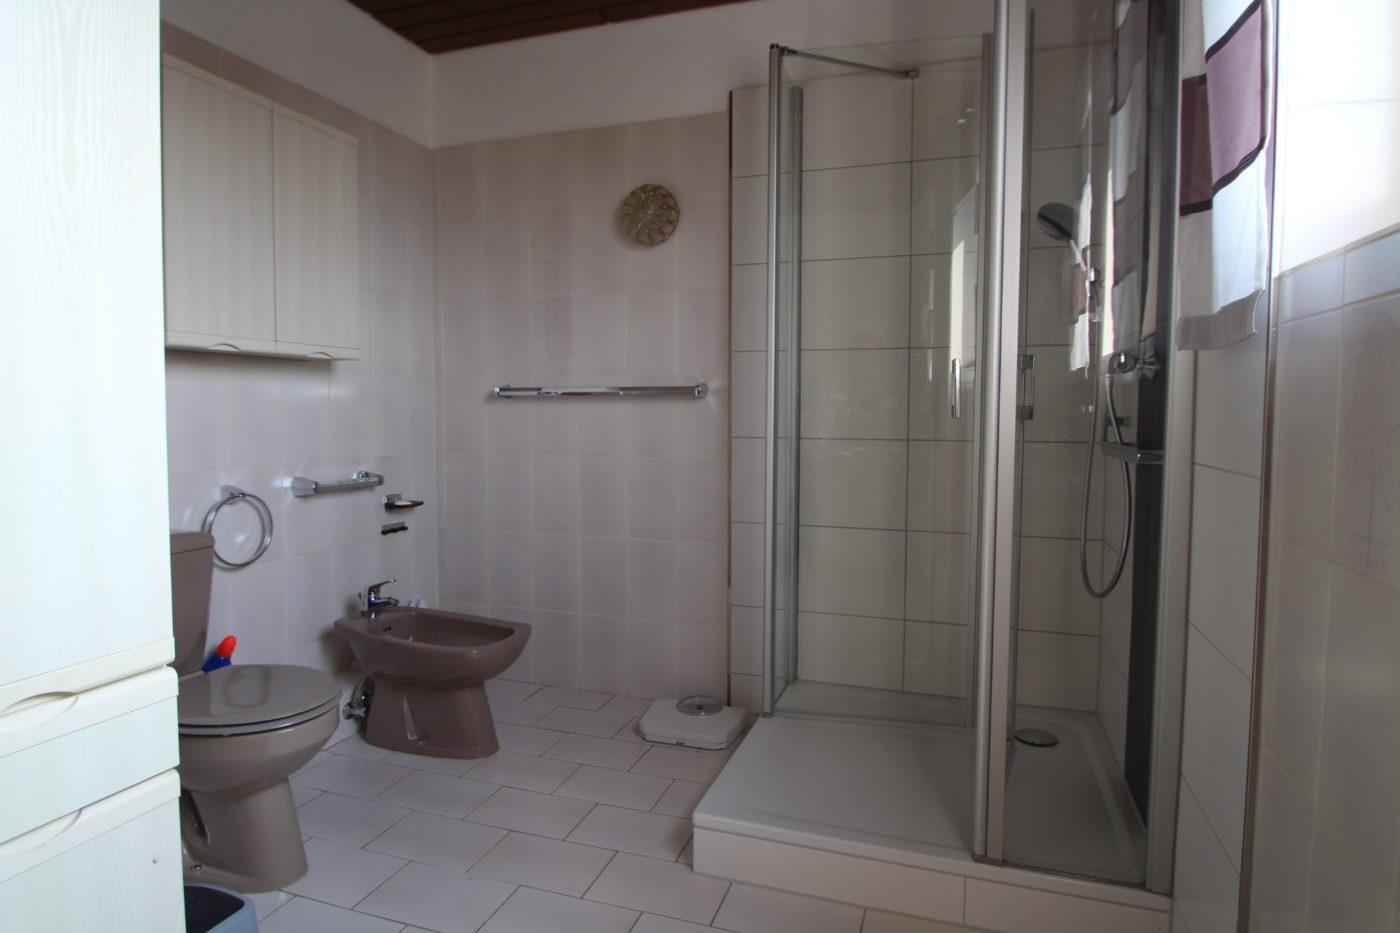 leere und geerbte Immobilie, Vorher Foto Blickfang Home Staging